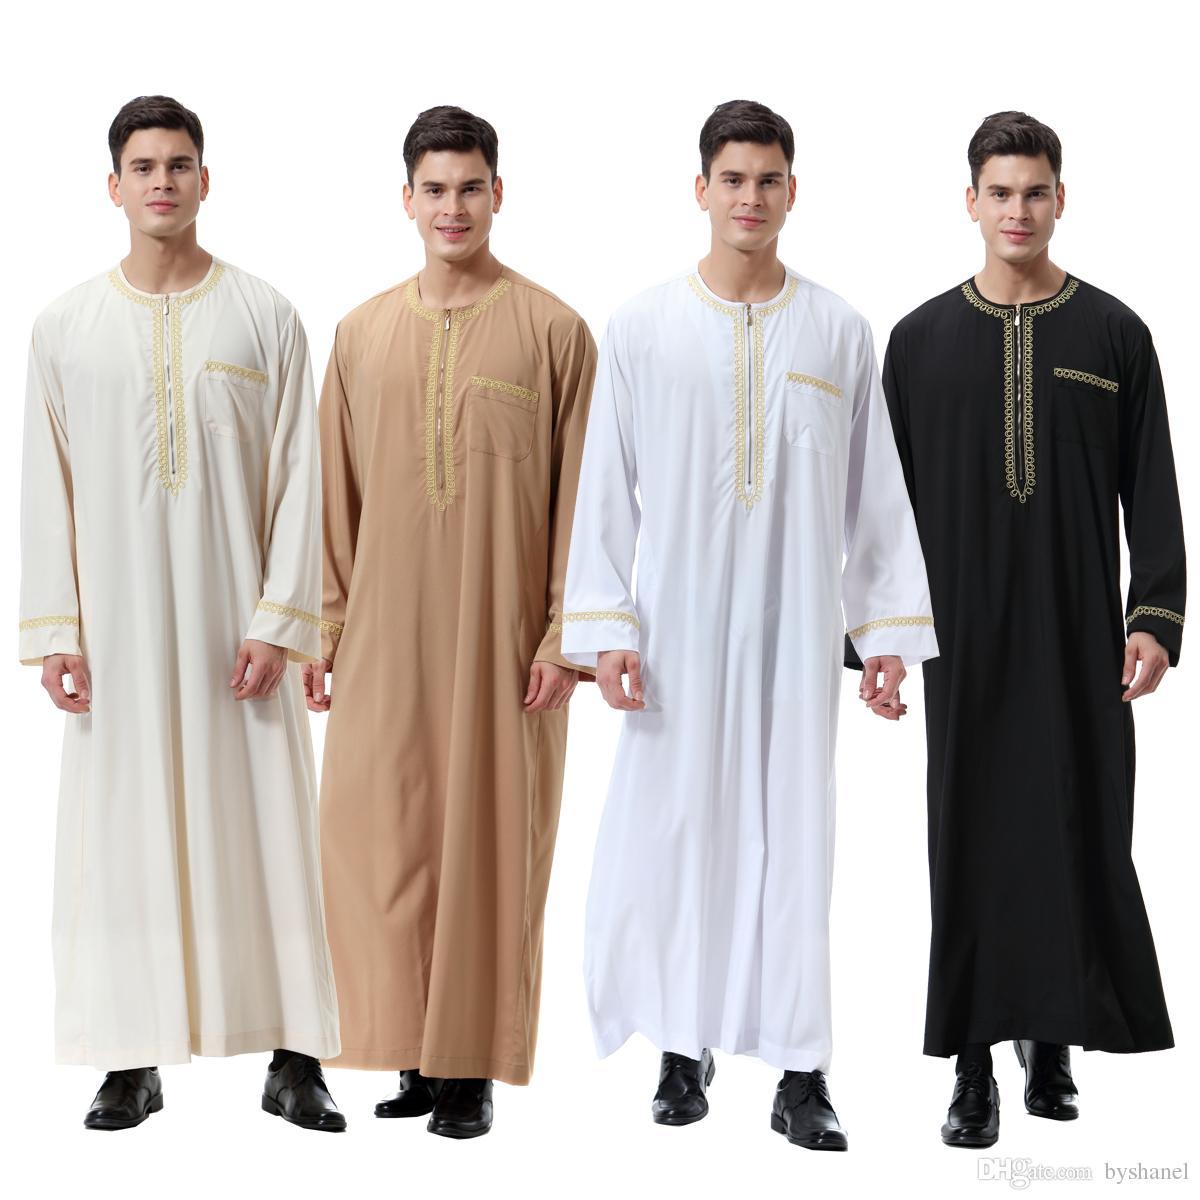 d16ffc7e4 Al por mayor- Hombres Arabia Thobe ropa islámica musulmana Árabe Hombres  Vestido Thobe Árabe Abayas Vestido Indio Hombres Kaftan Robe